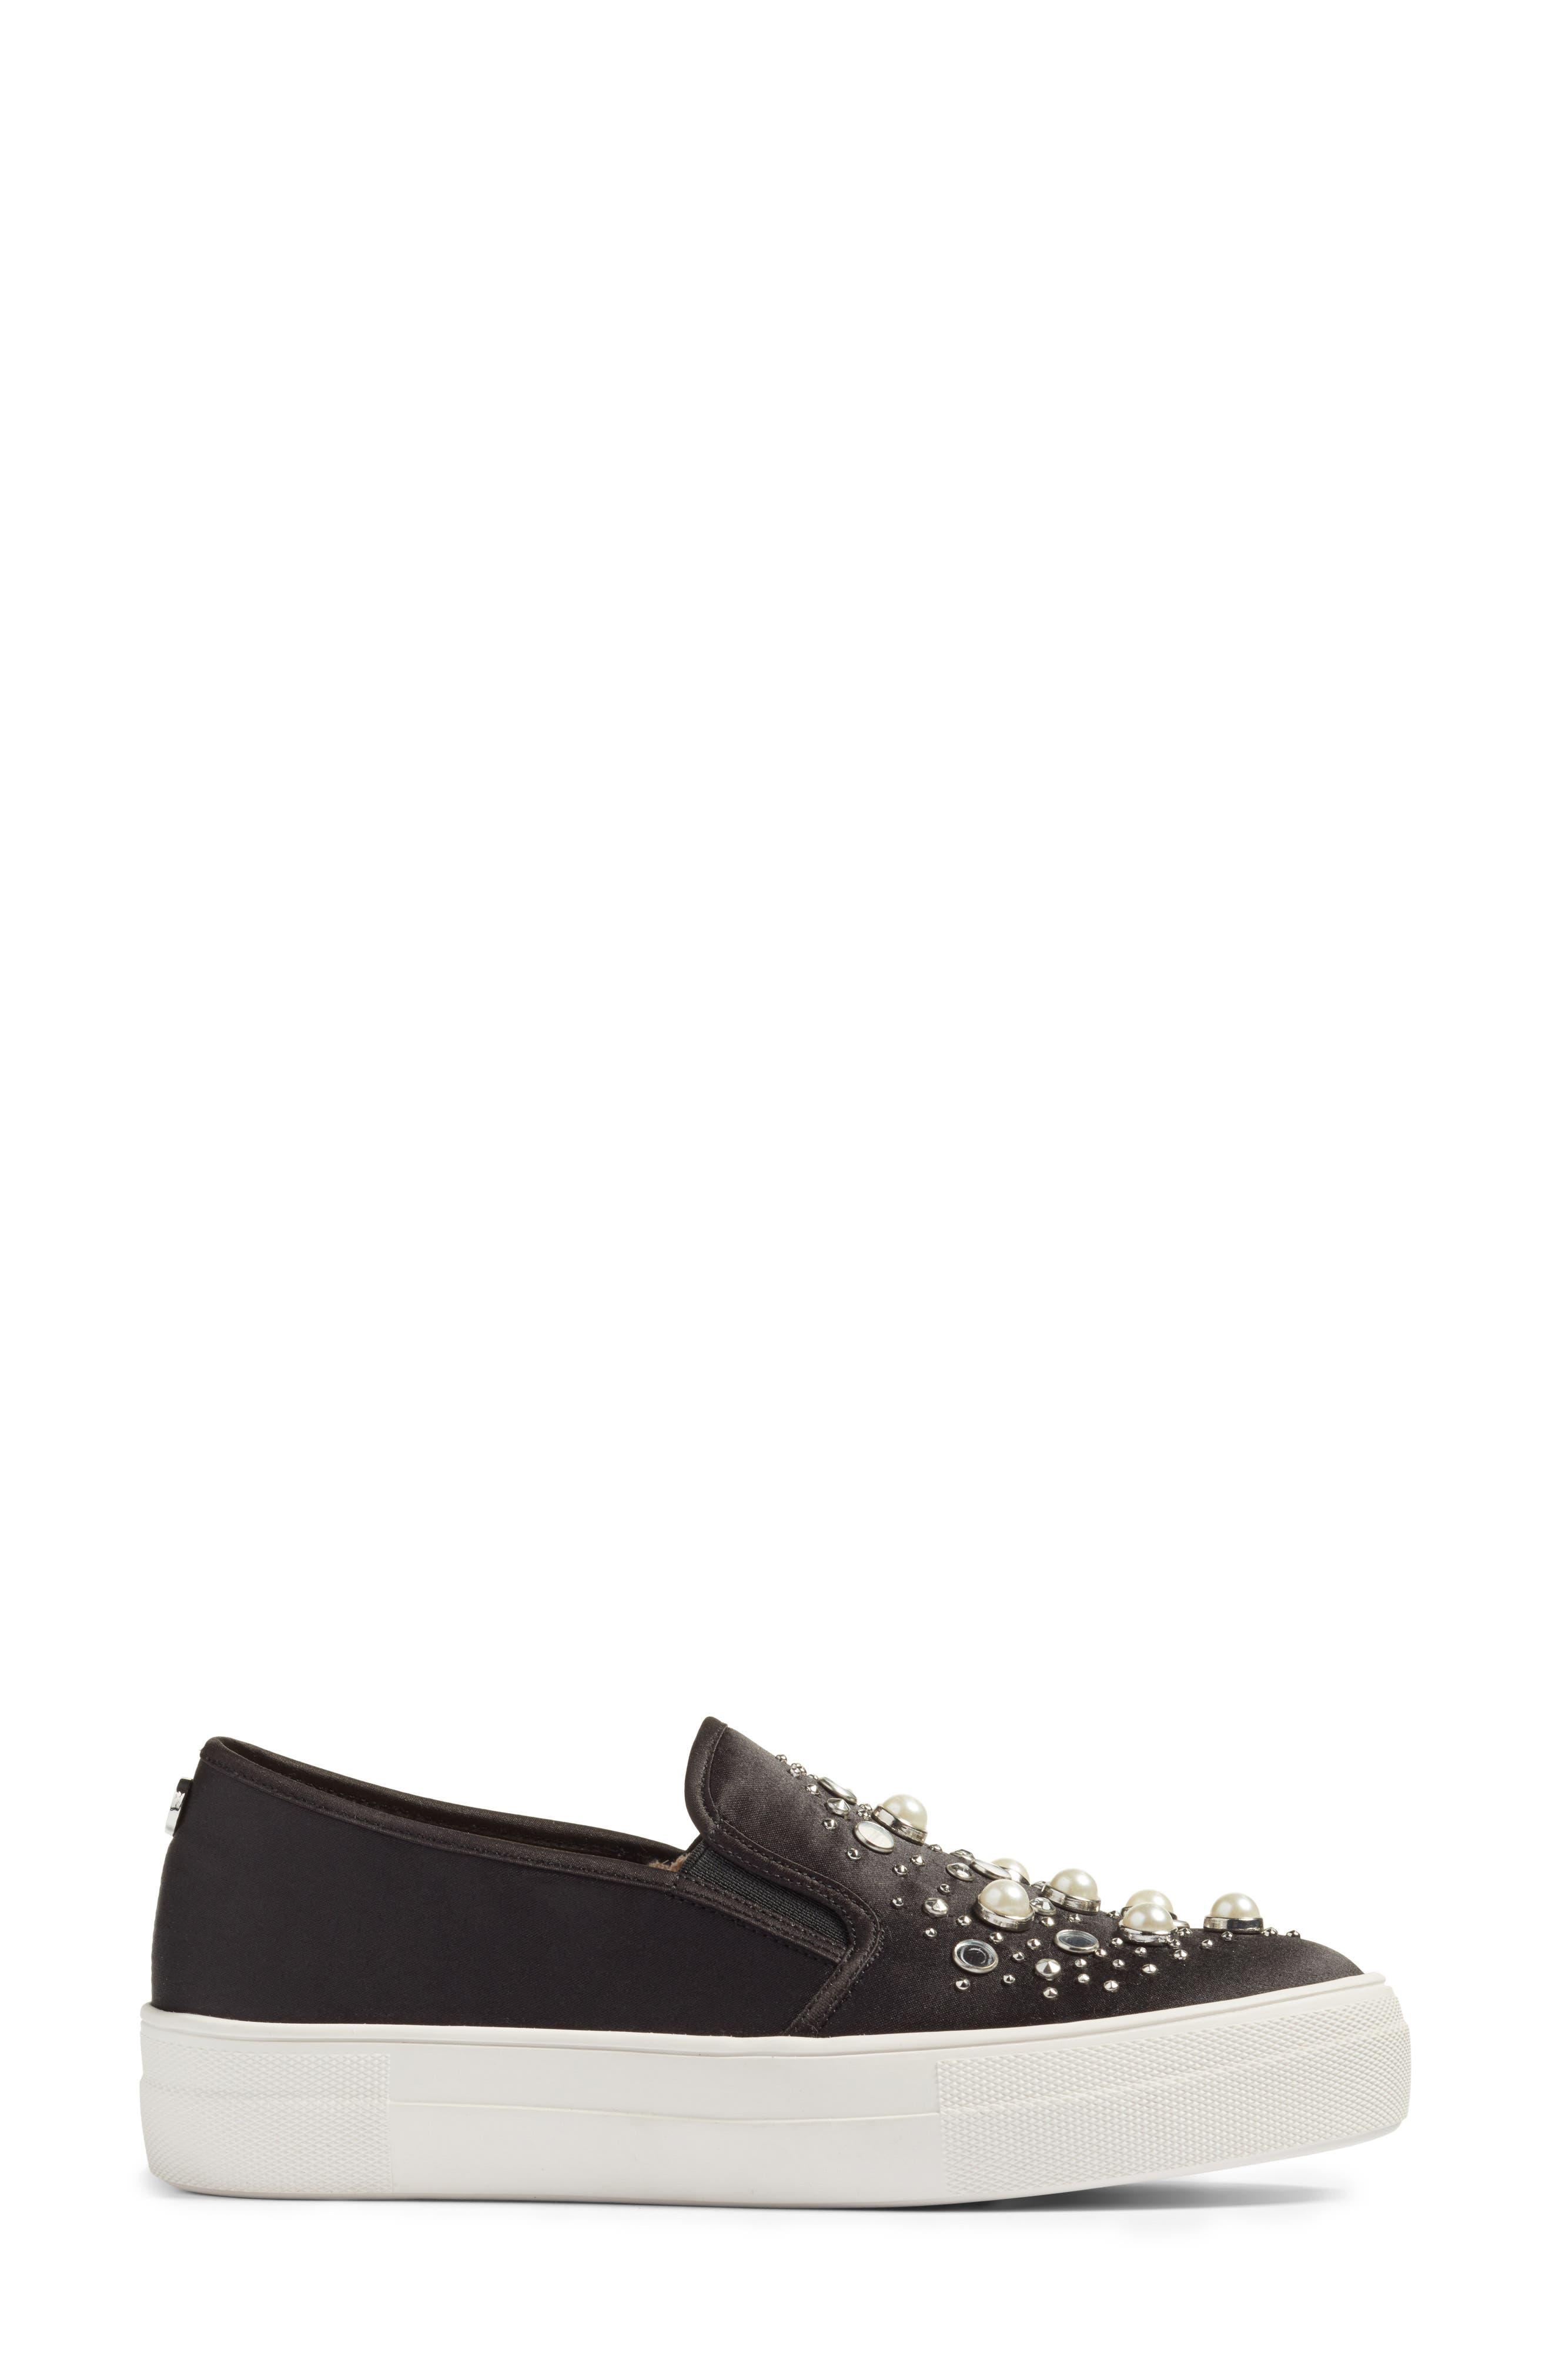 Glade Embellished Slip-On Sneaker,                             Alternate thumbnail 3, color,                             001